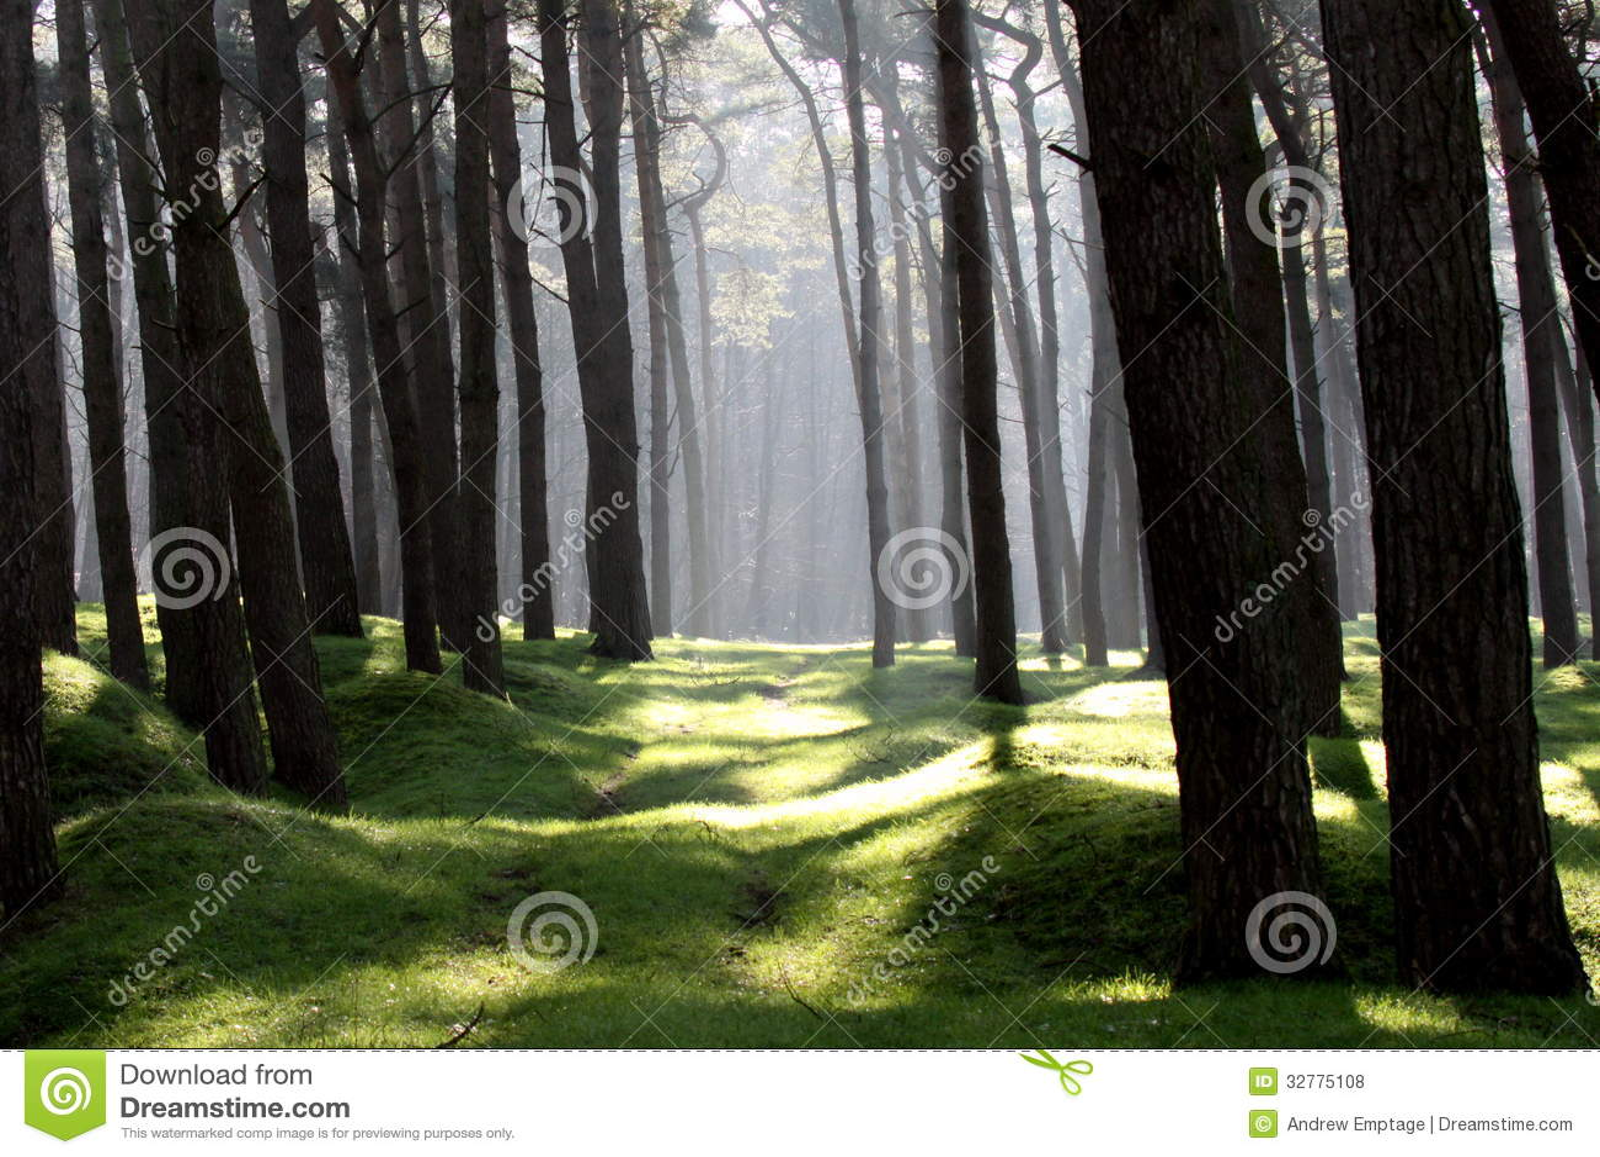 ww1 landscape memorial forest - photo #21